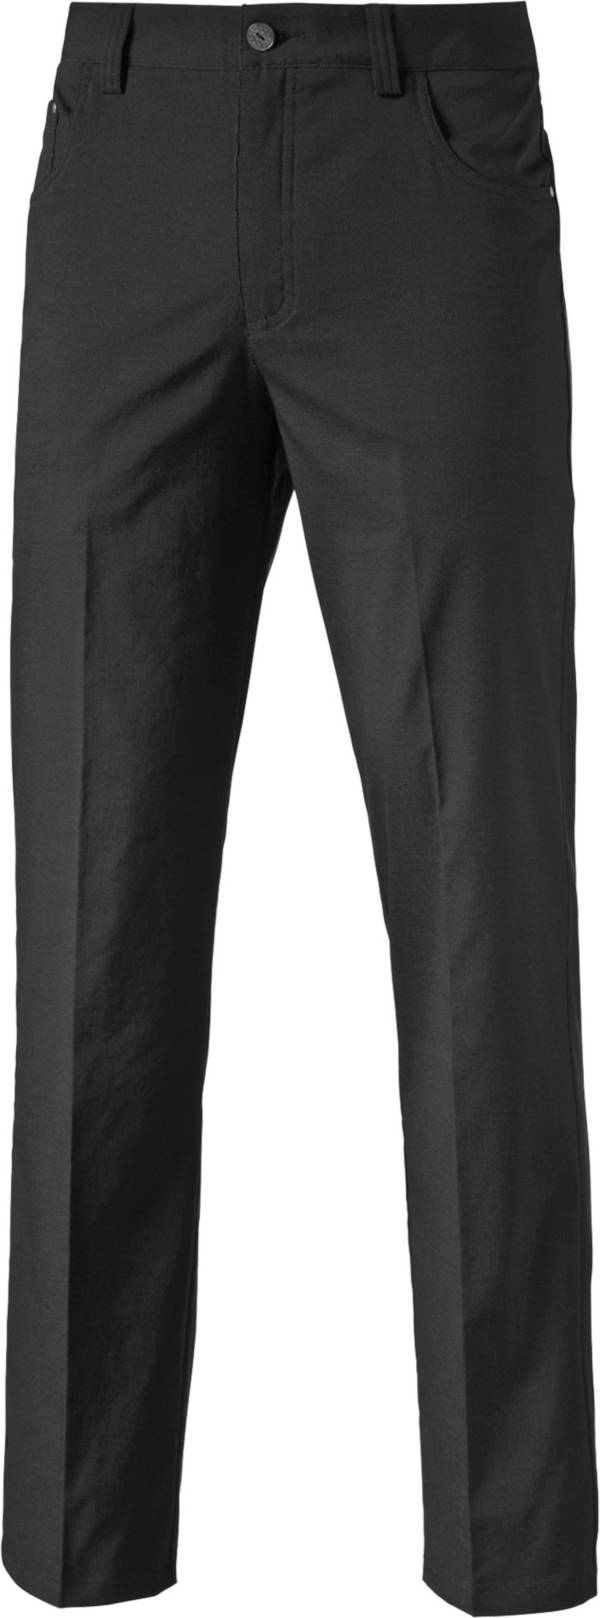 PUMA Men's 6 Pocket Golf Pants product image